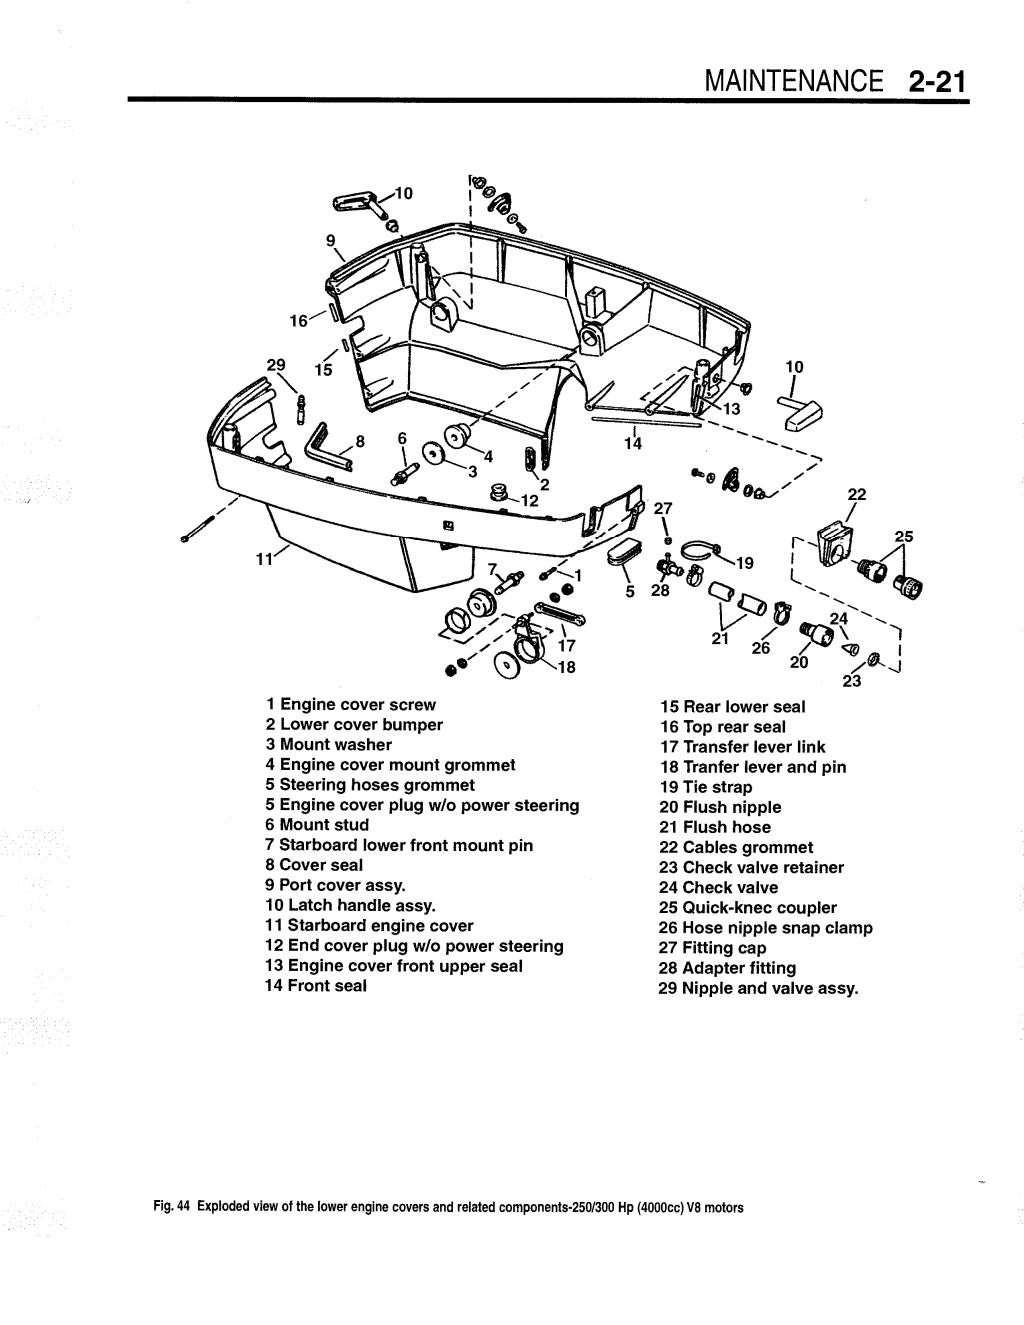 1994 Johnson Evinrude Outboard 140 HP Service Repair Manual